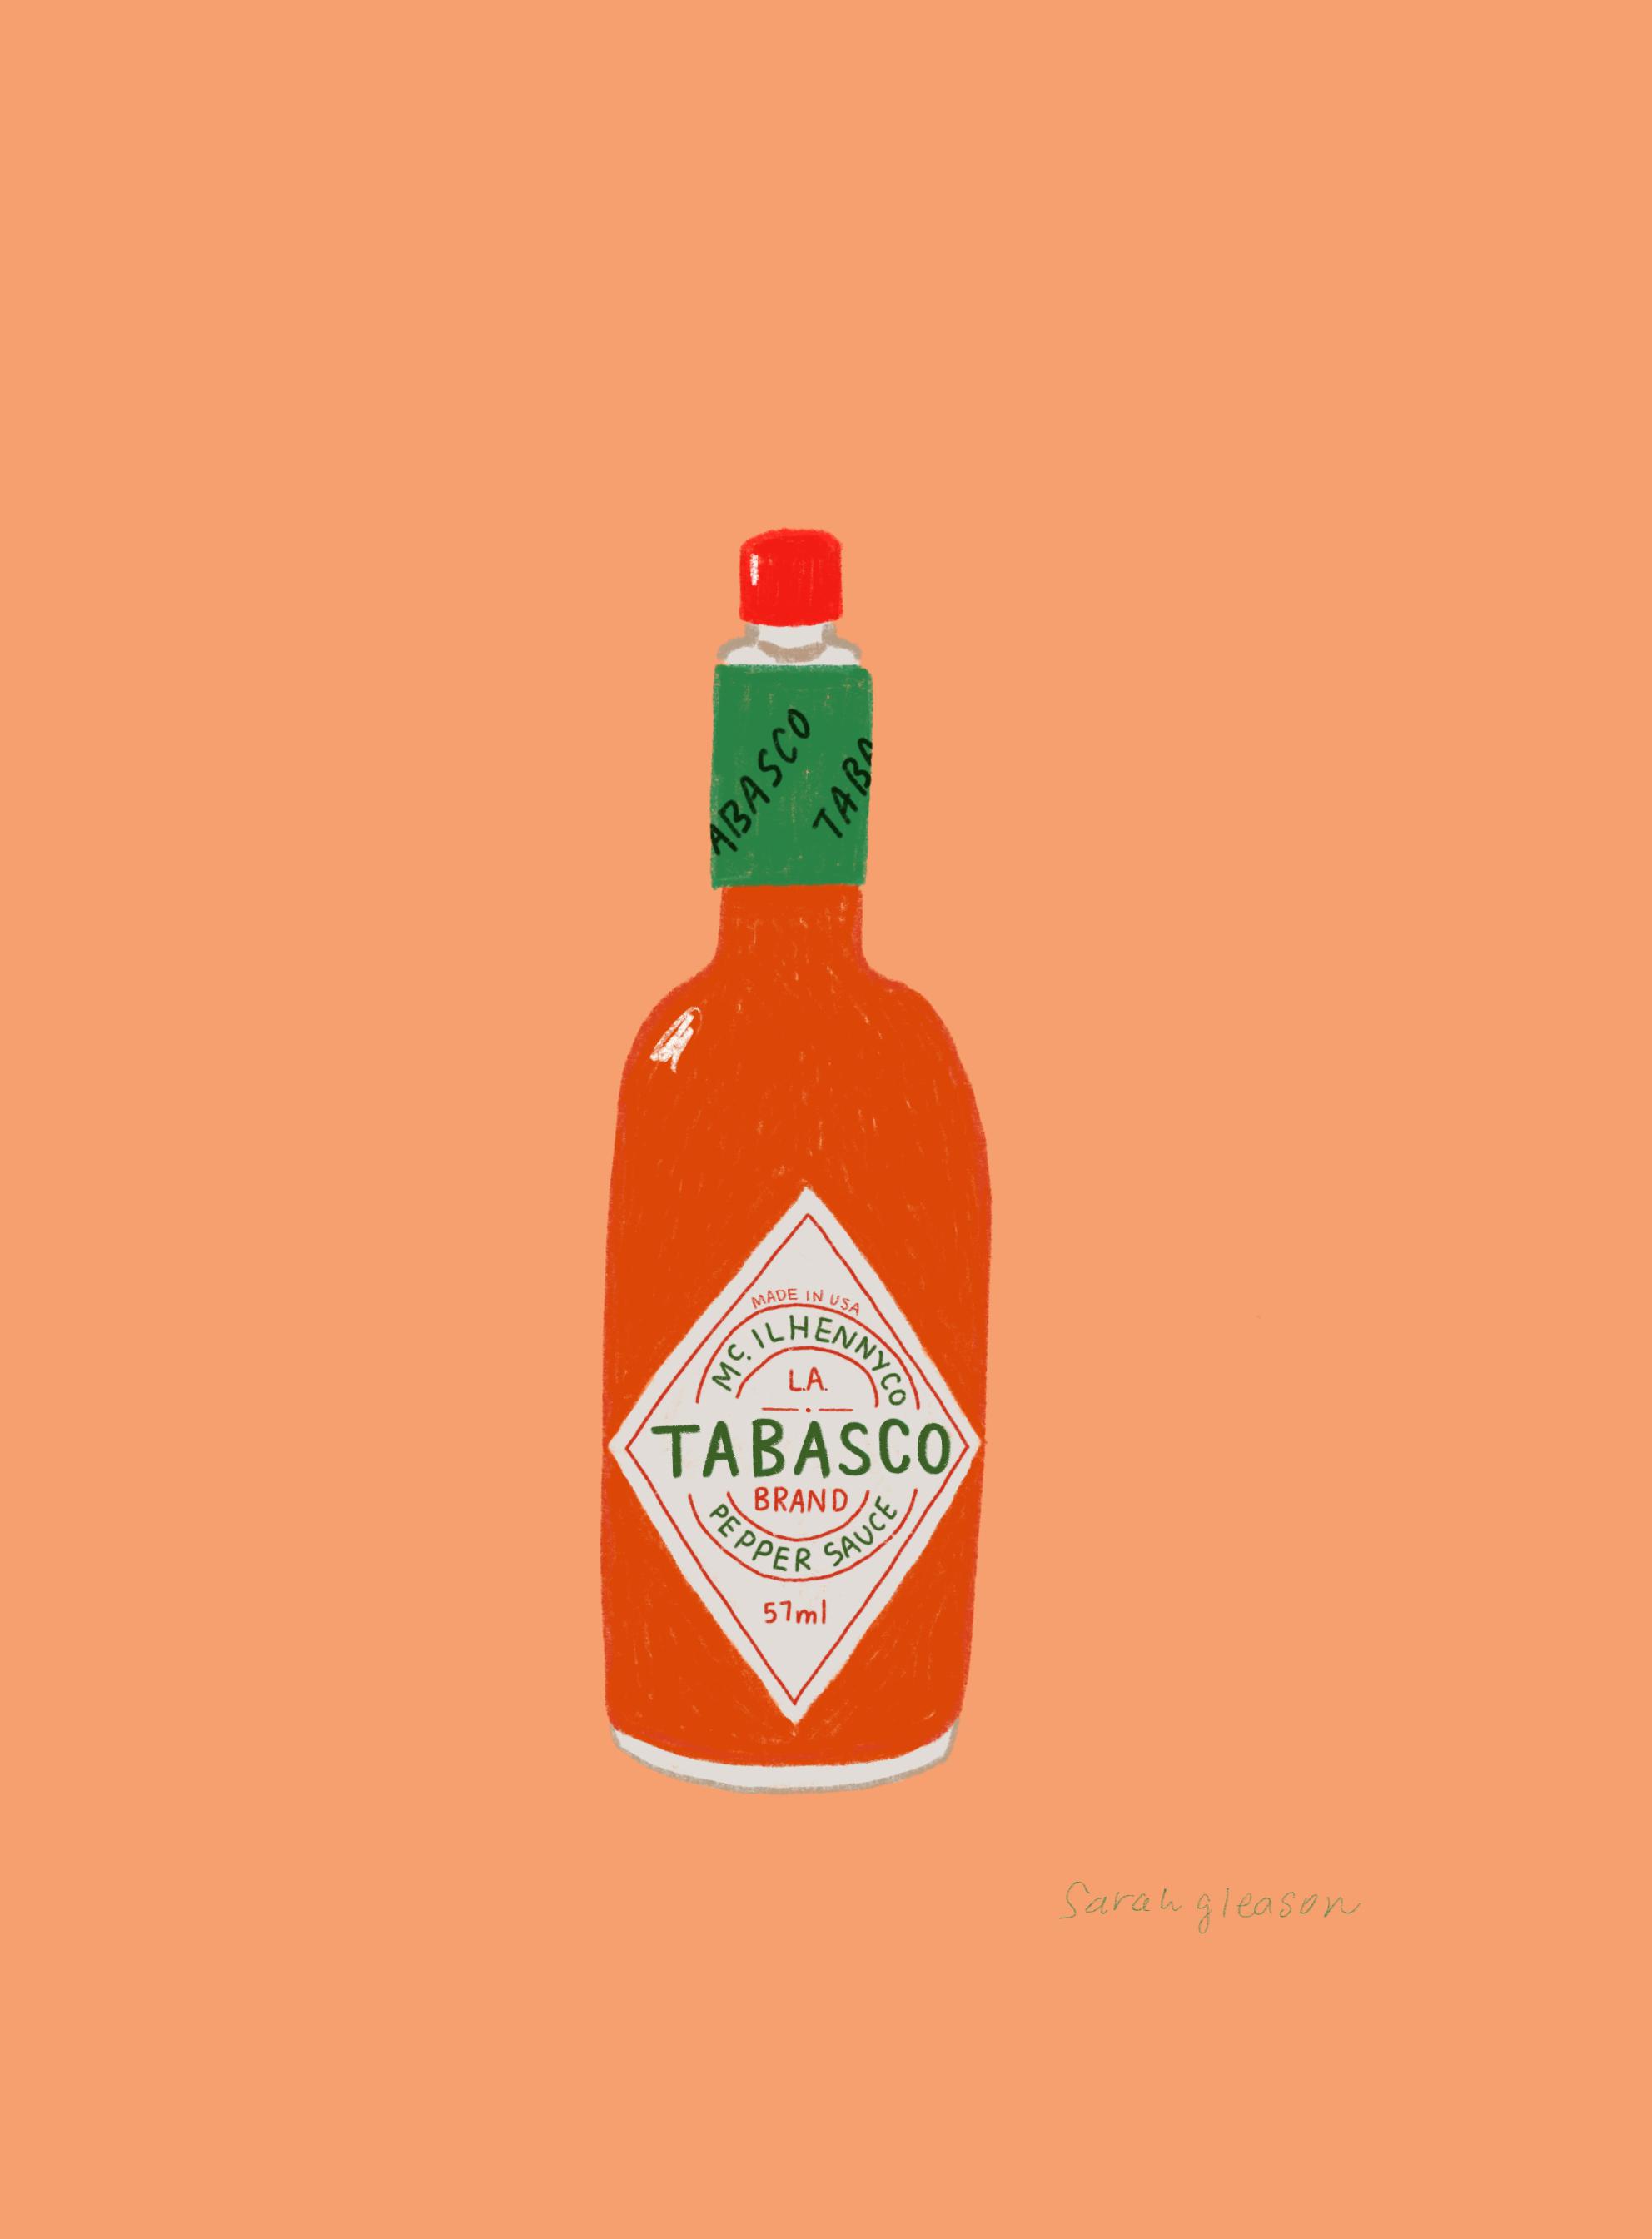 Tabasco Sauce Tabasco Tabasco Sauce Gleason